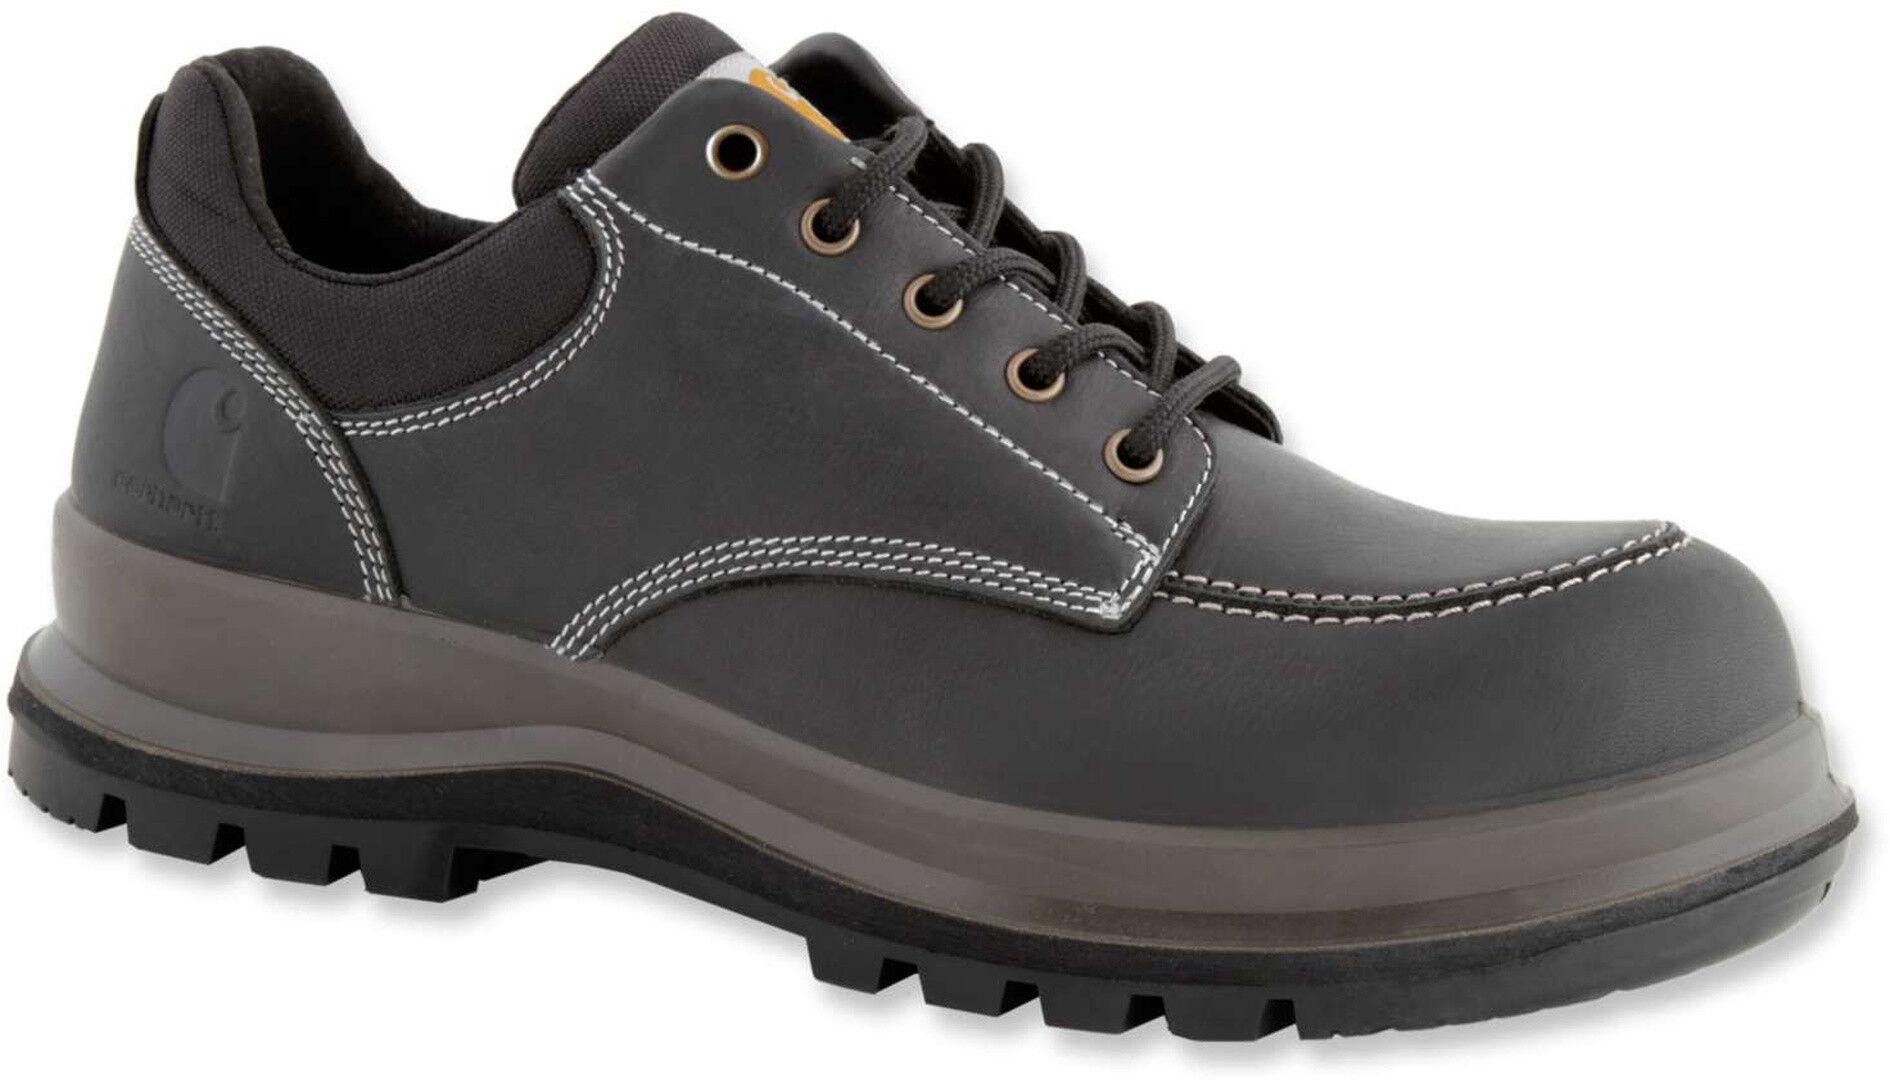 Carhartt Hamilton Rugged Flex S3 Zapatos